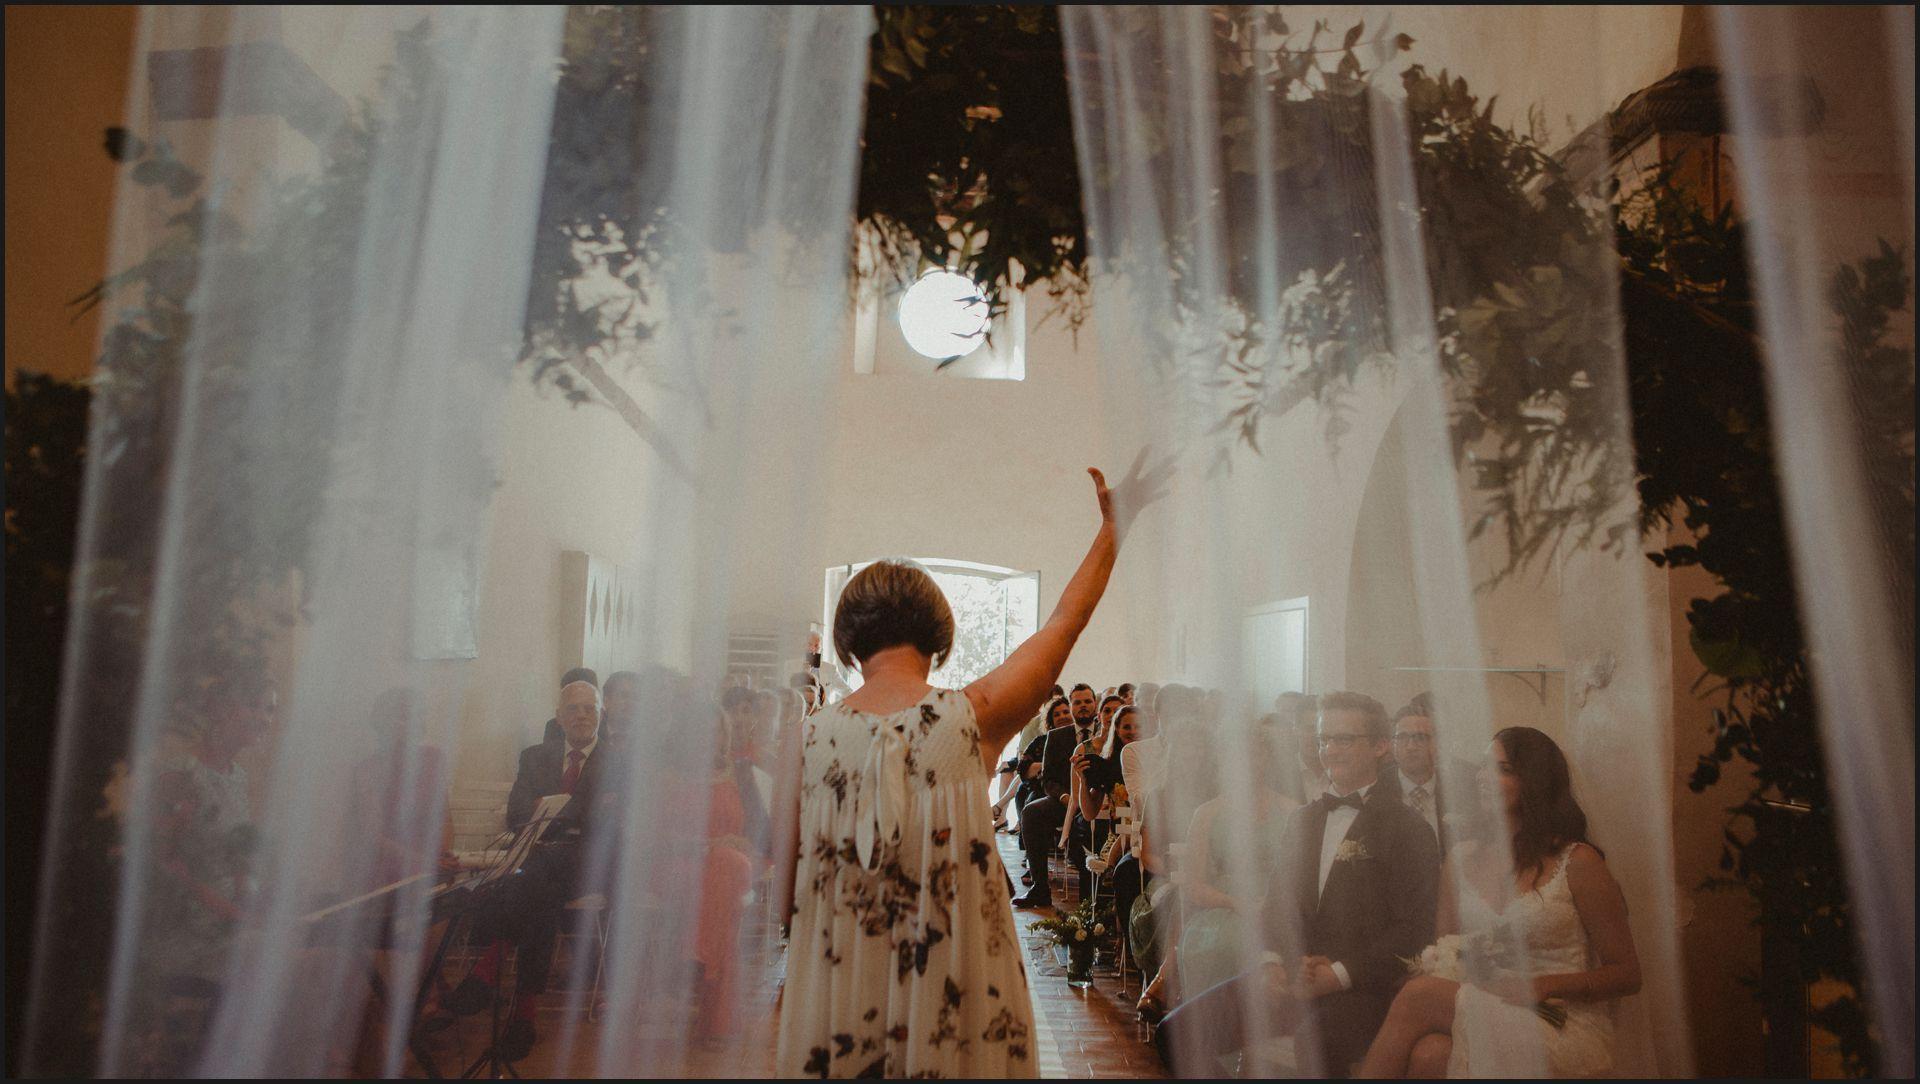 wedding, symbolic ceremony, wedding, umbria, nikis resort, veil